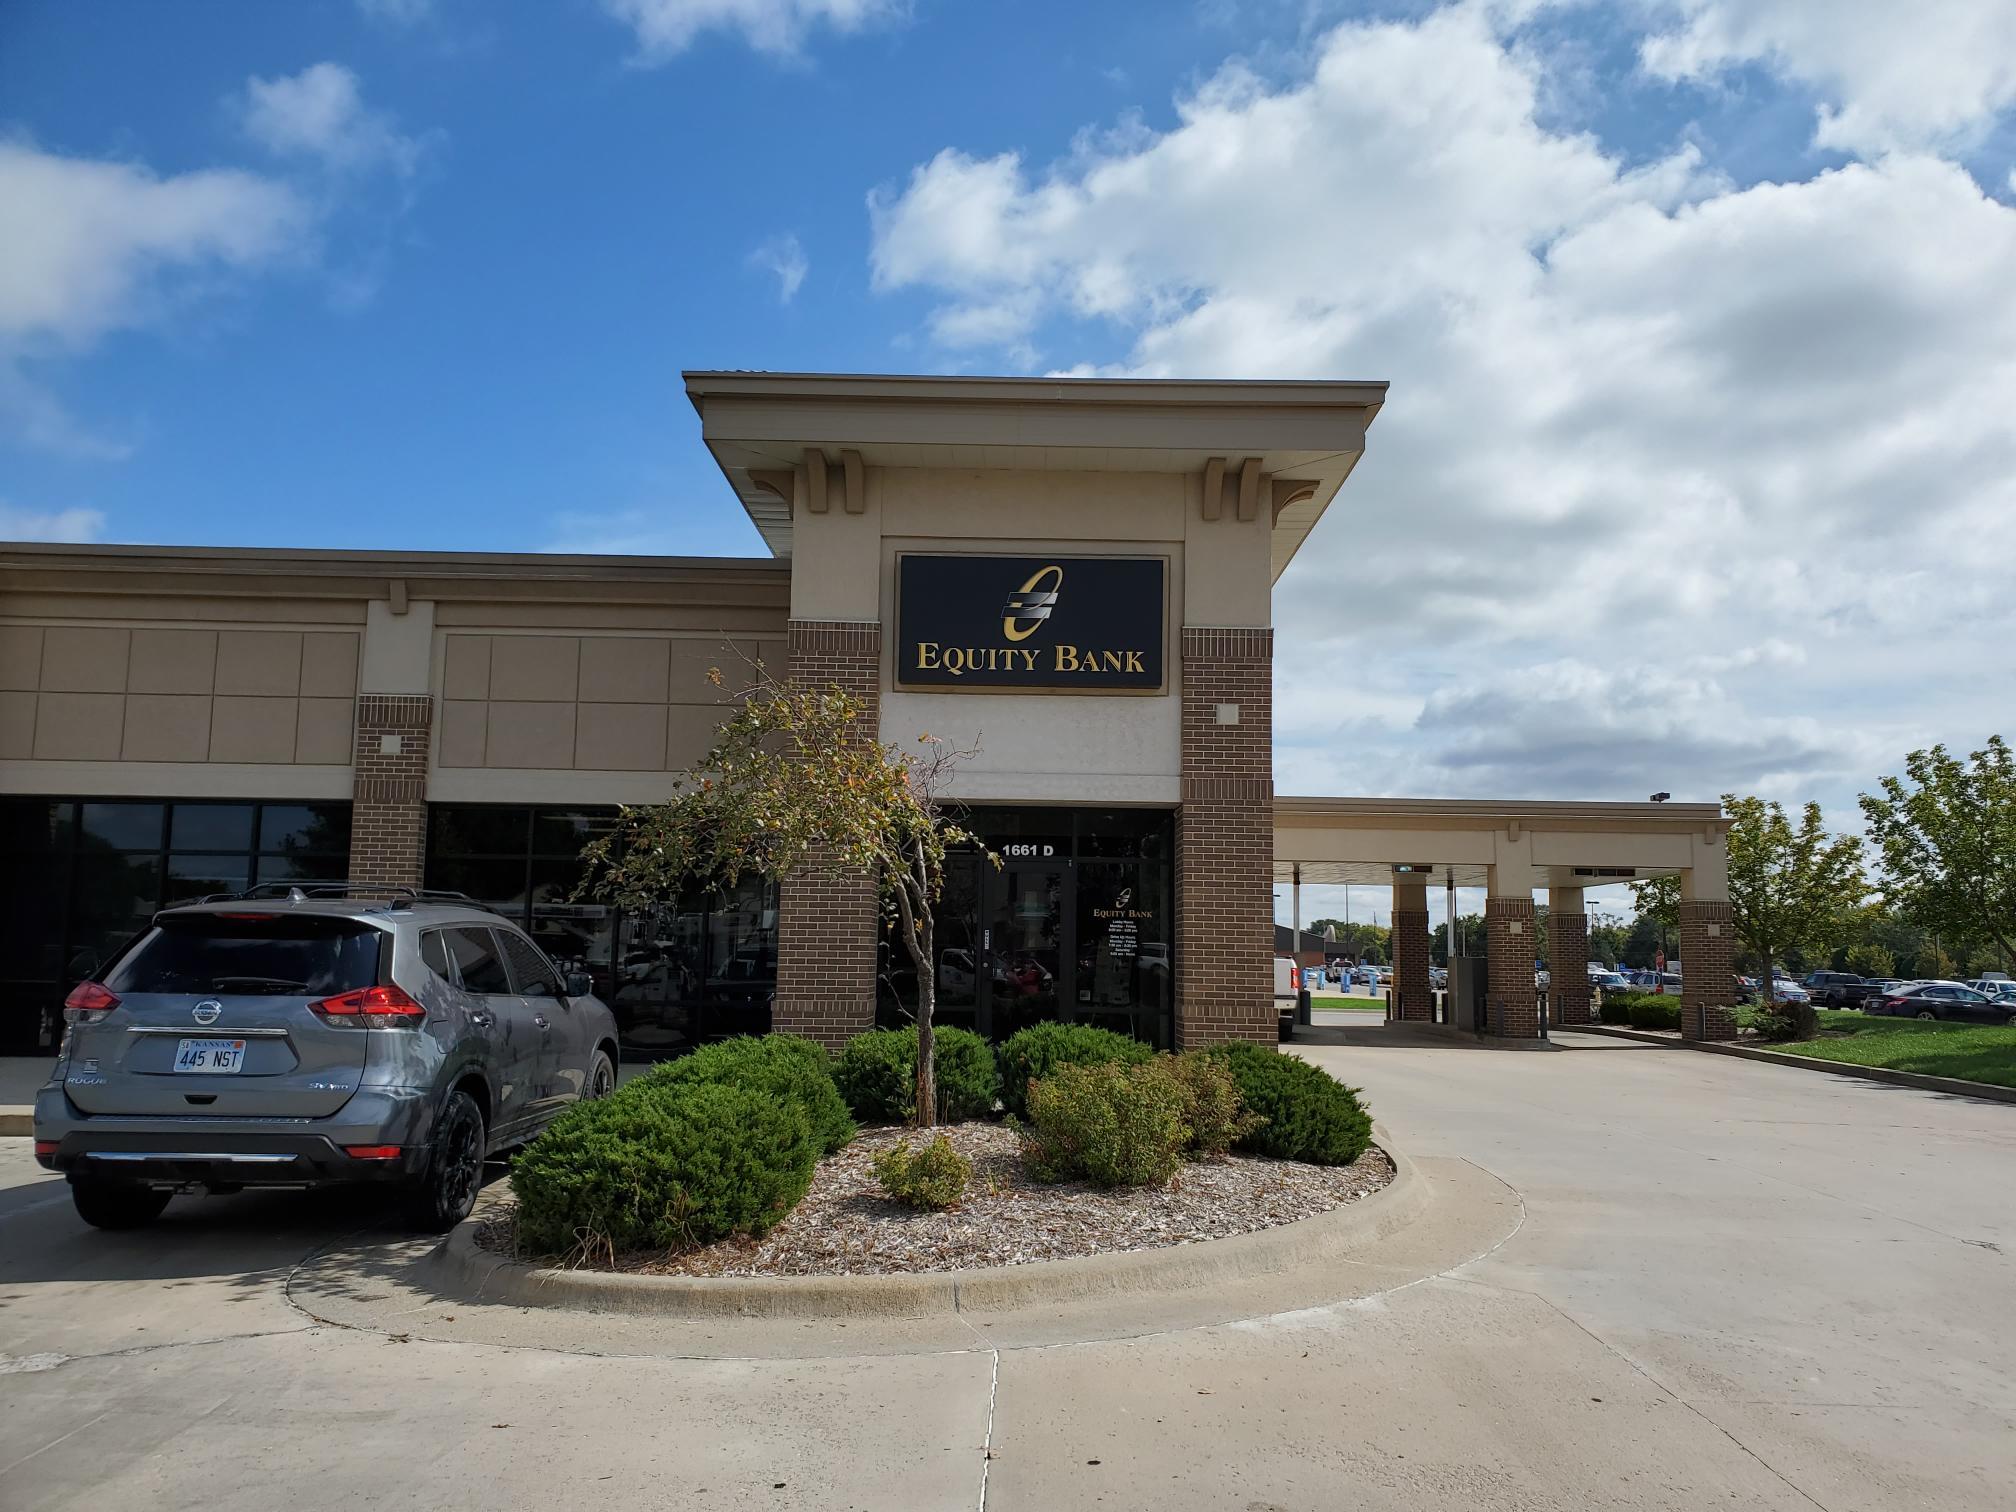 Equity Bank full service bank in Salina Kansas